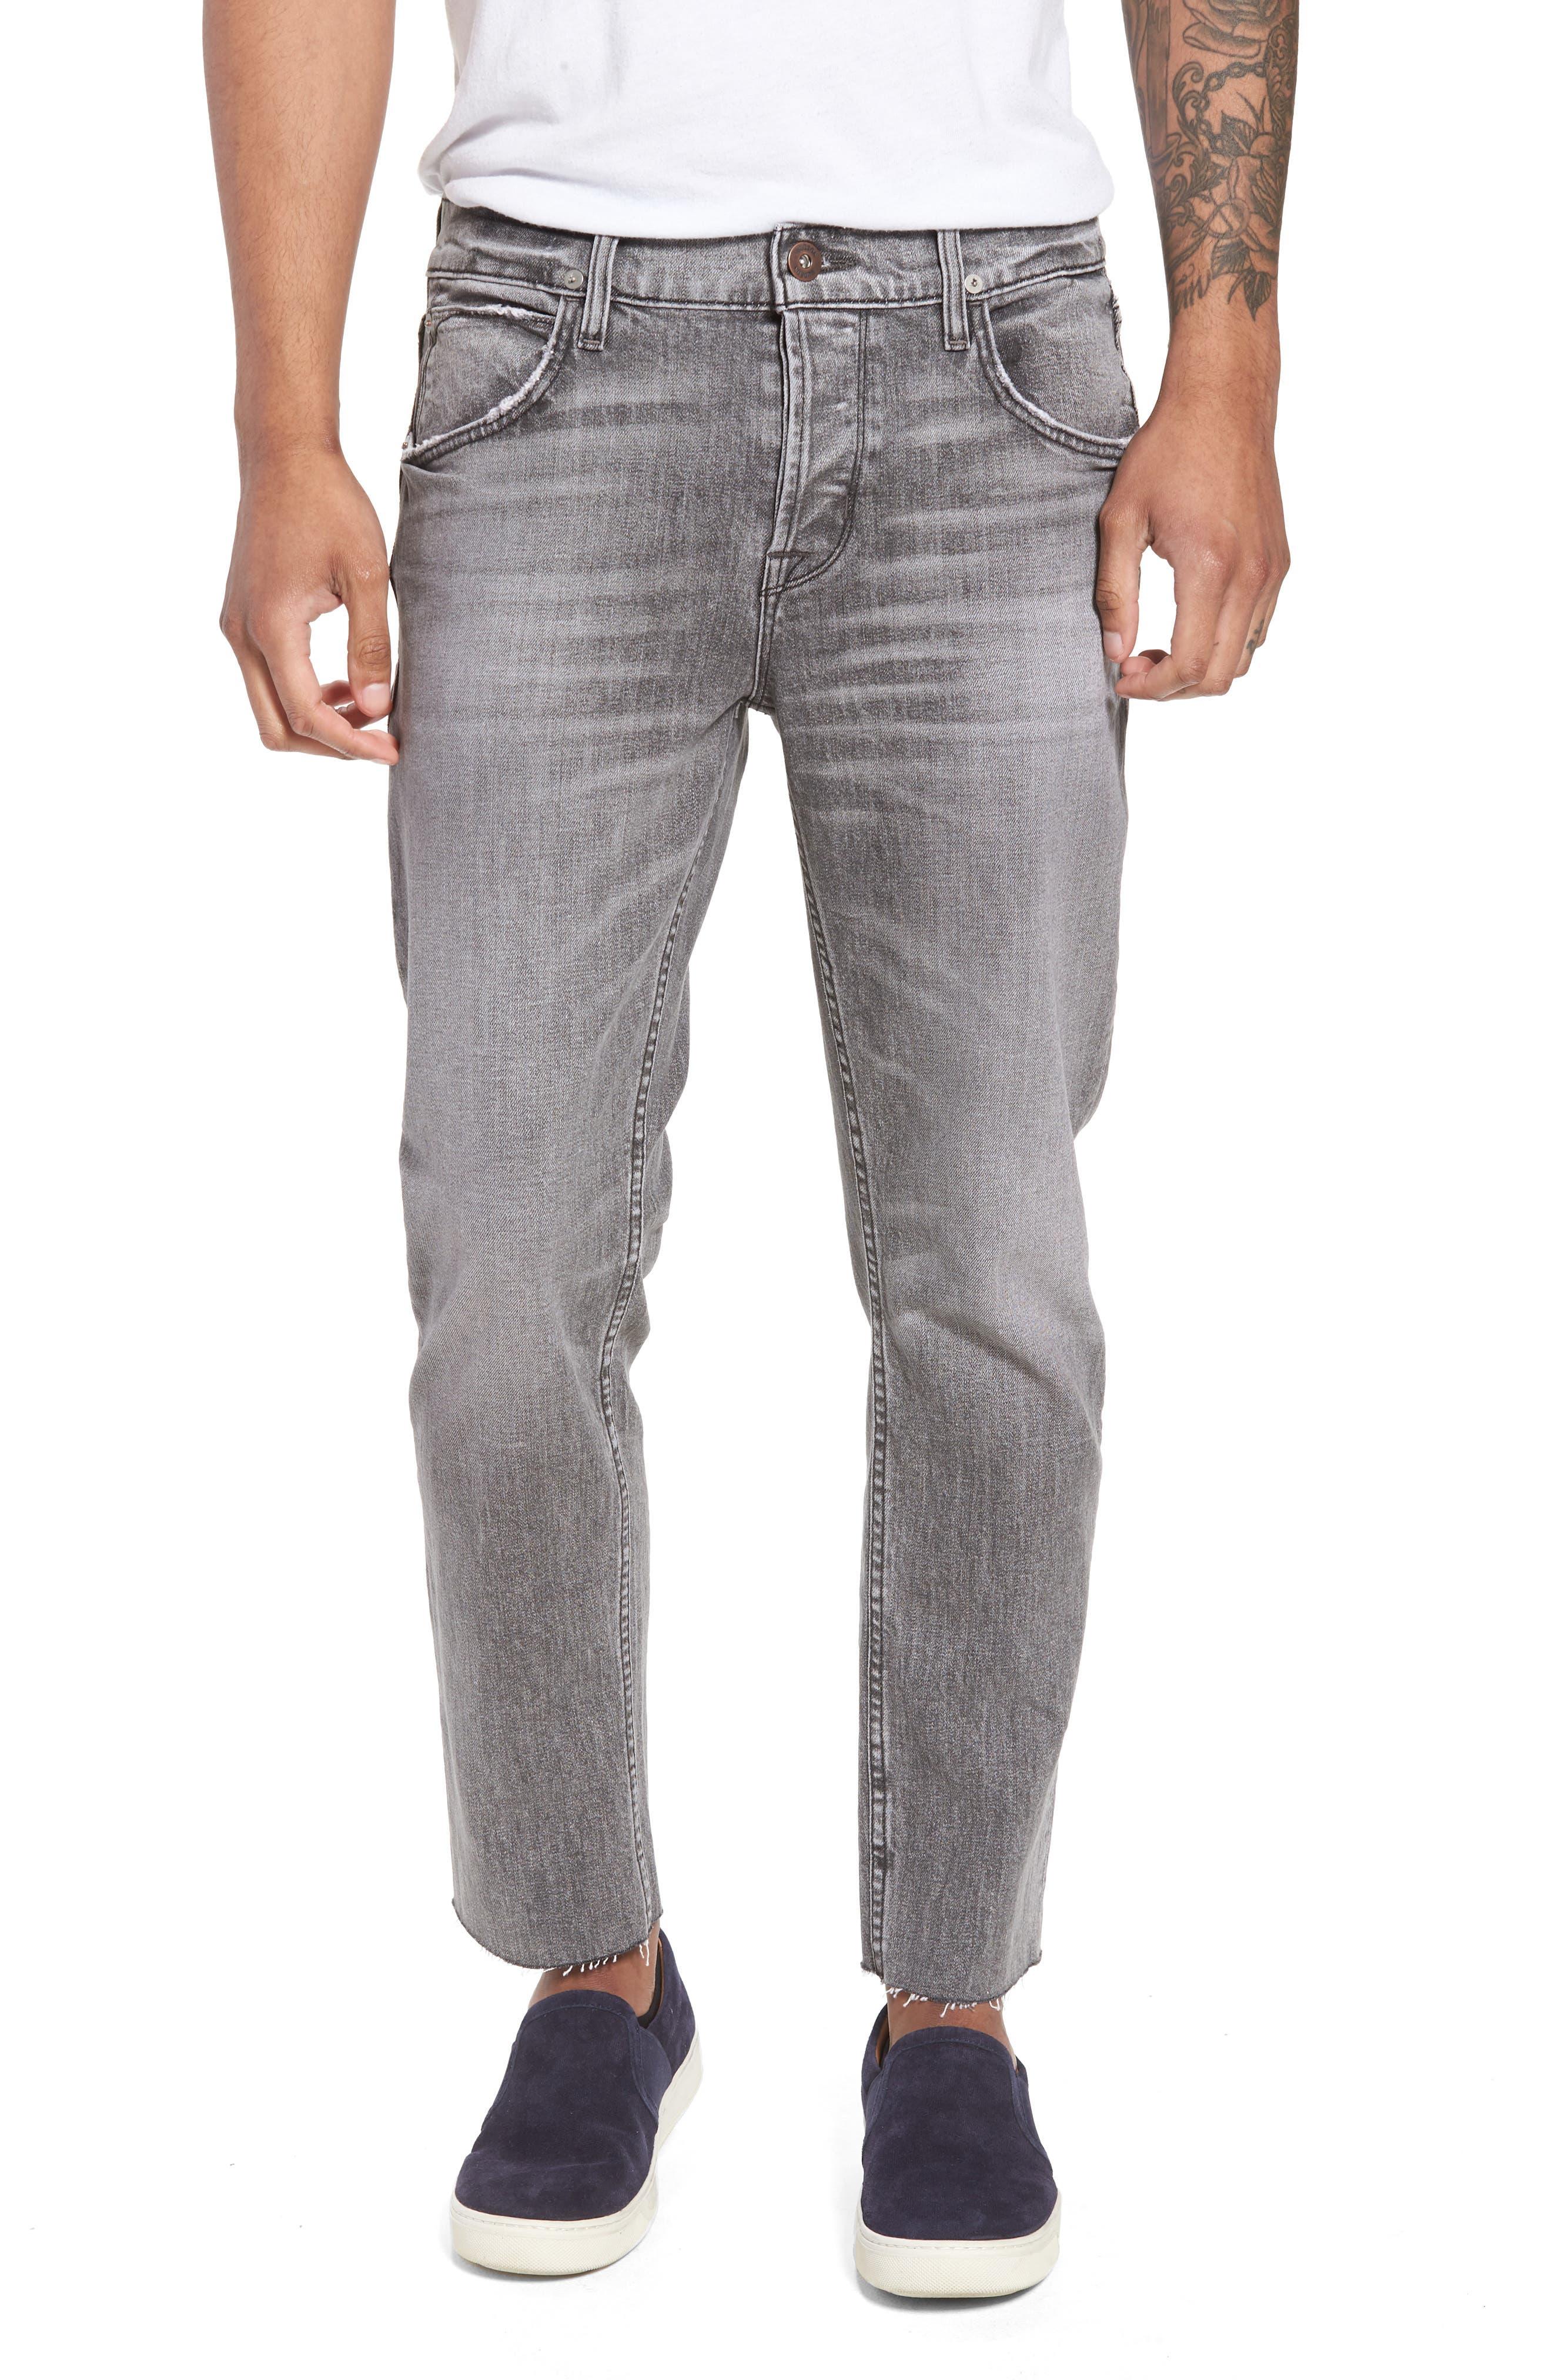 HUDSON JEANS Blake Slim Fit Jeans, Main, color, 063